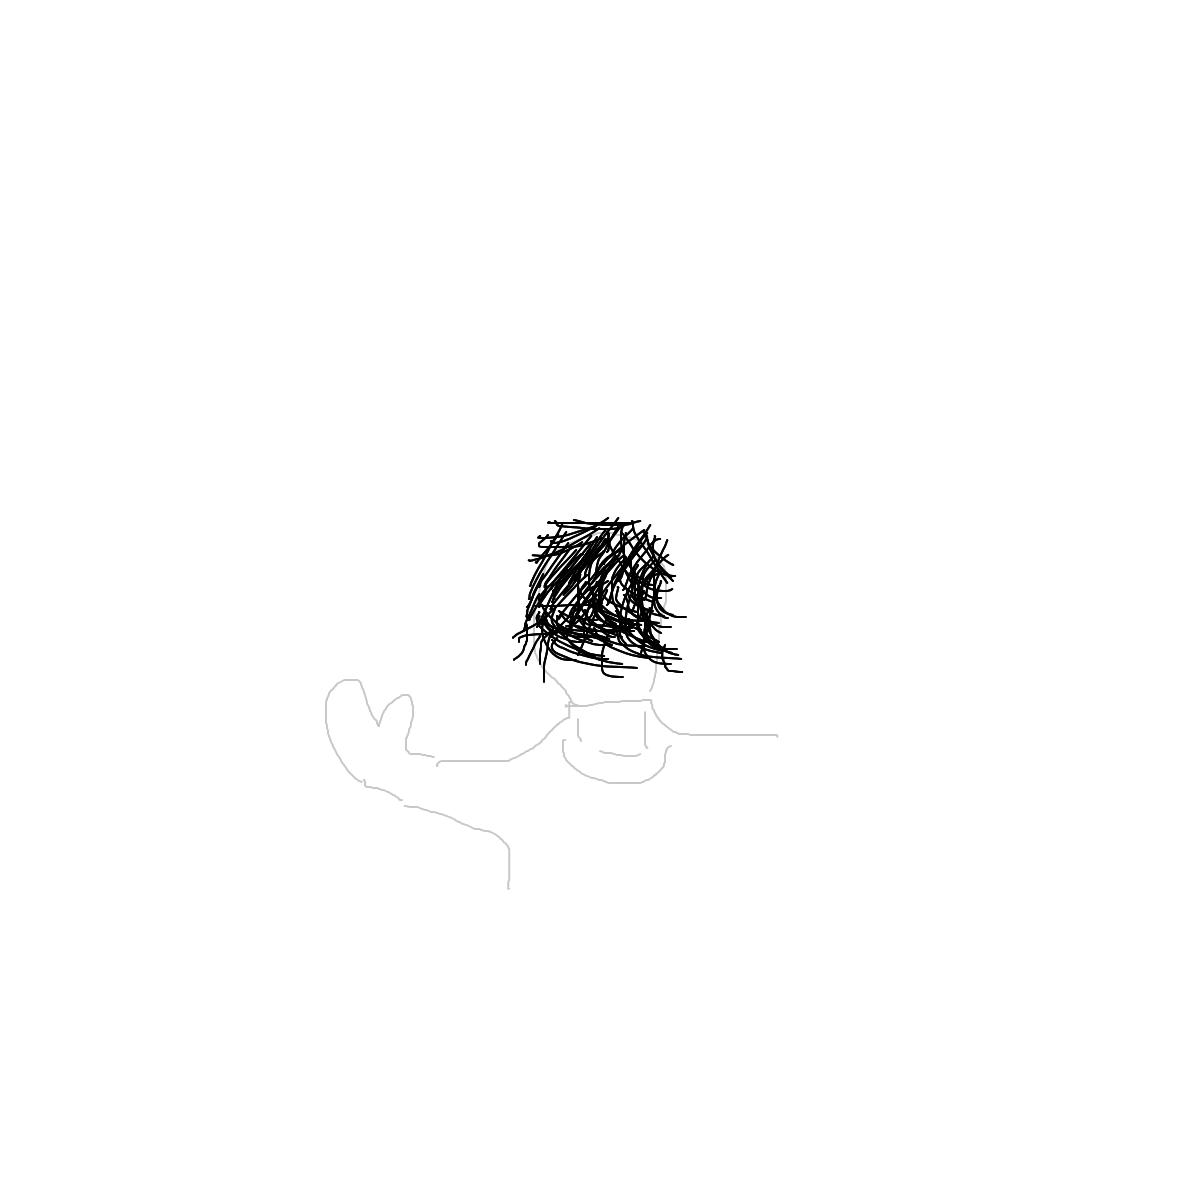 BAAAM drawing#5253 lat:39.9656028747558600lng: -75.1809158325195300